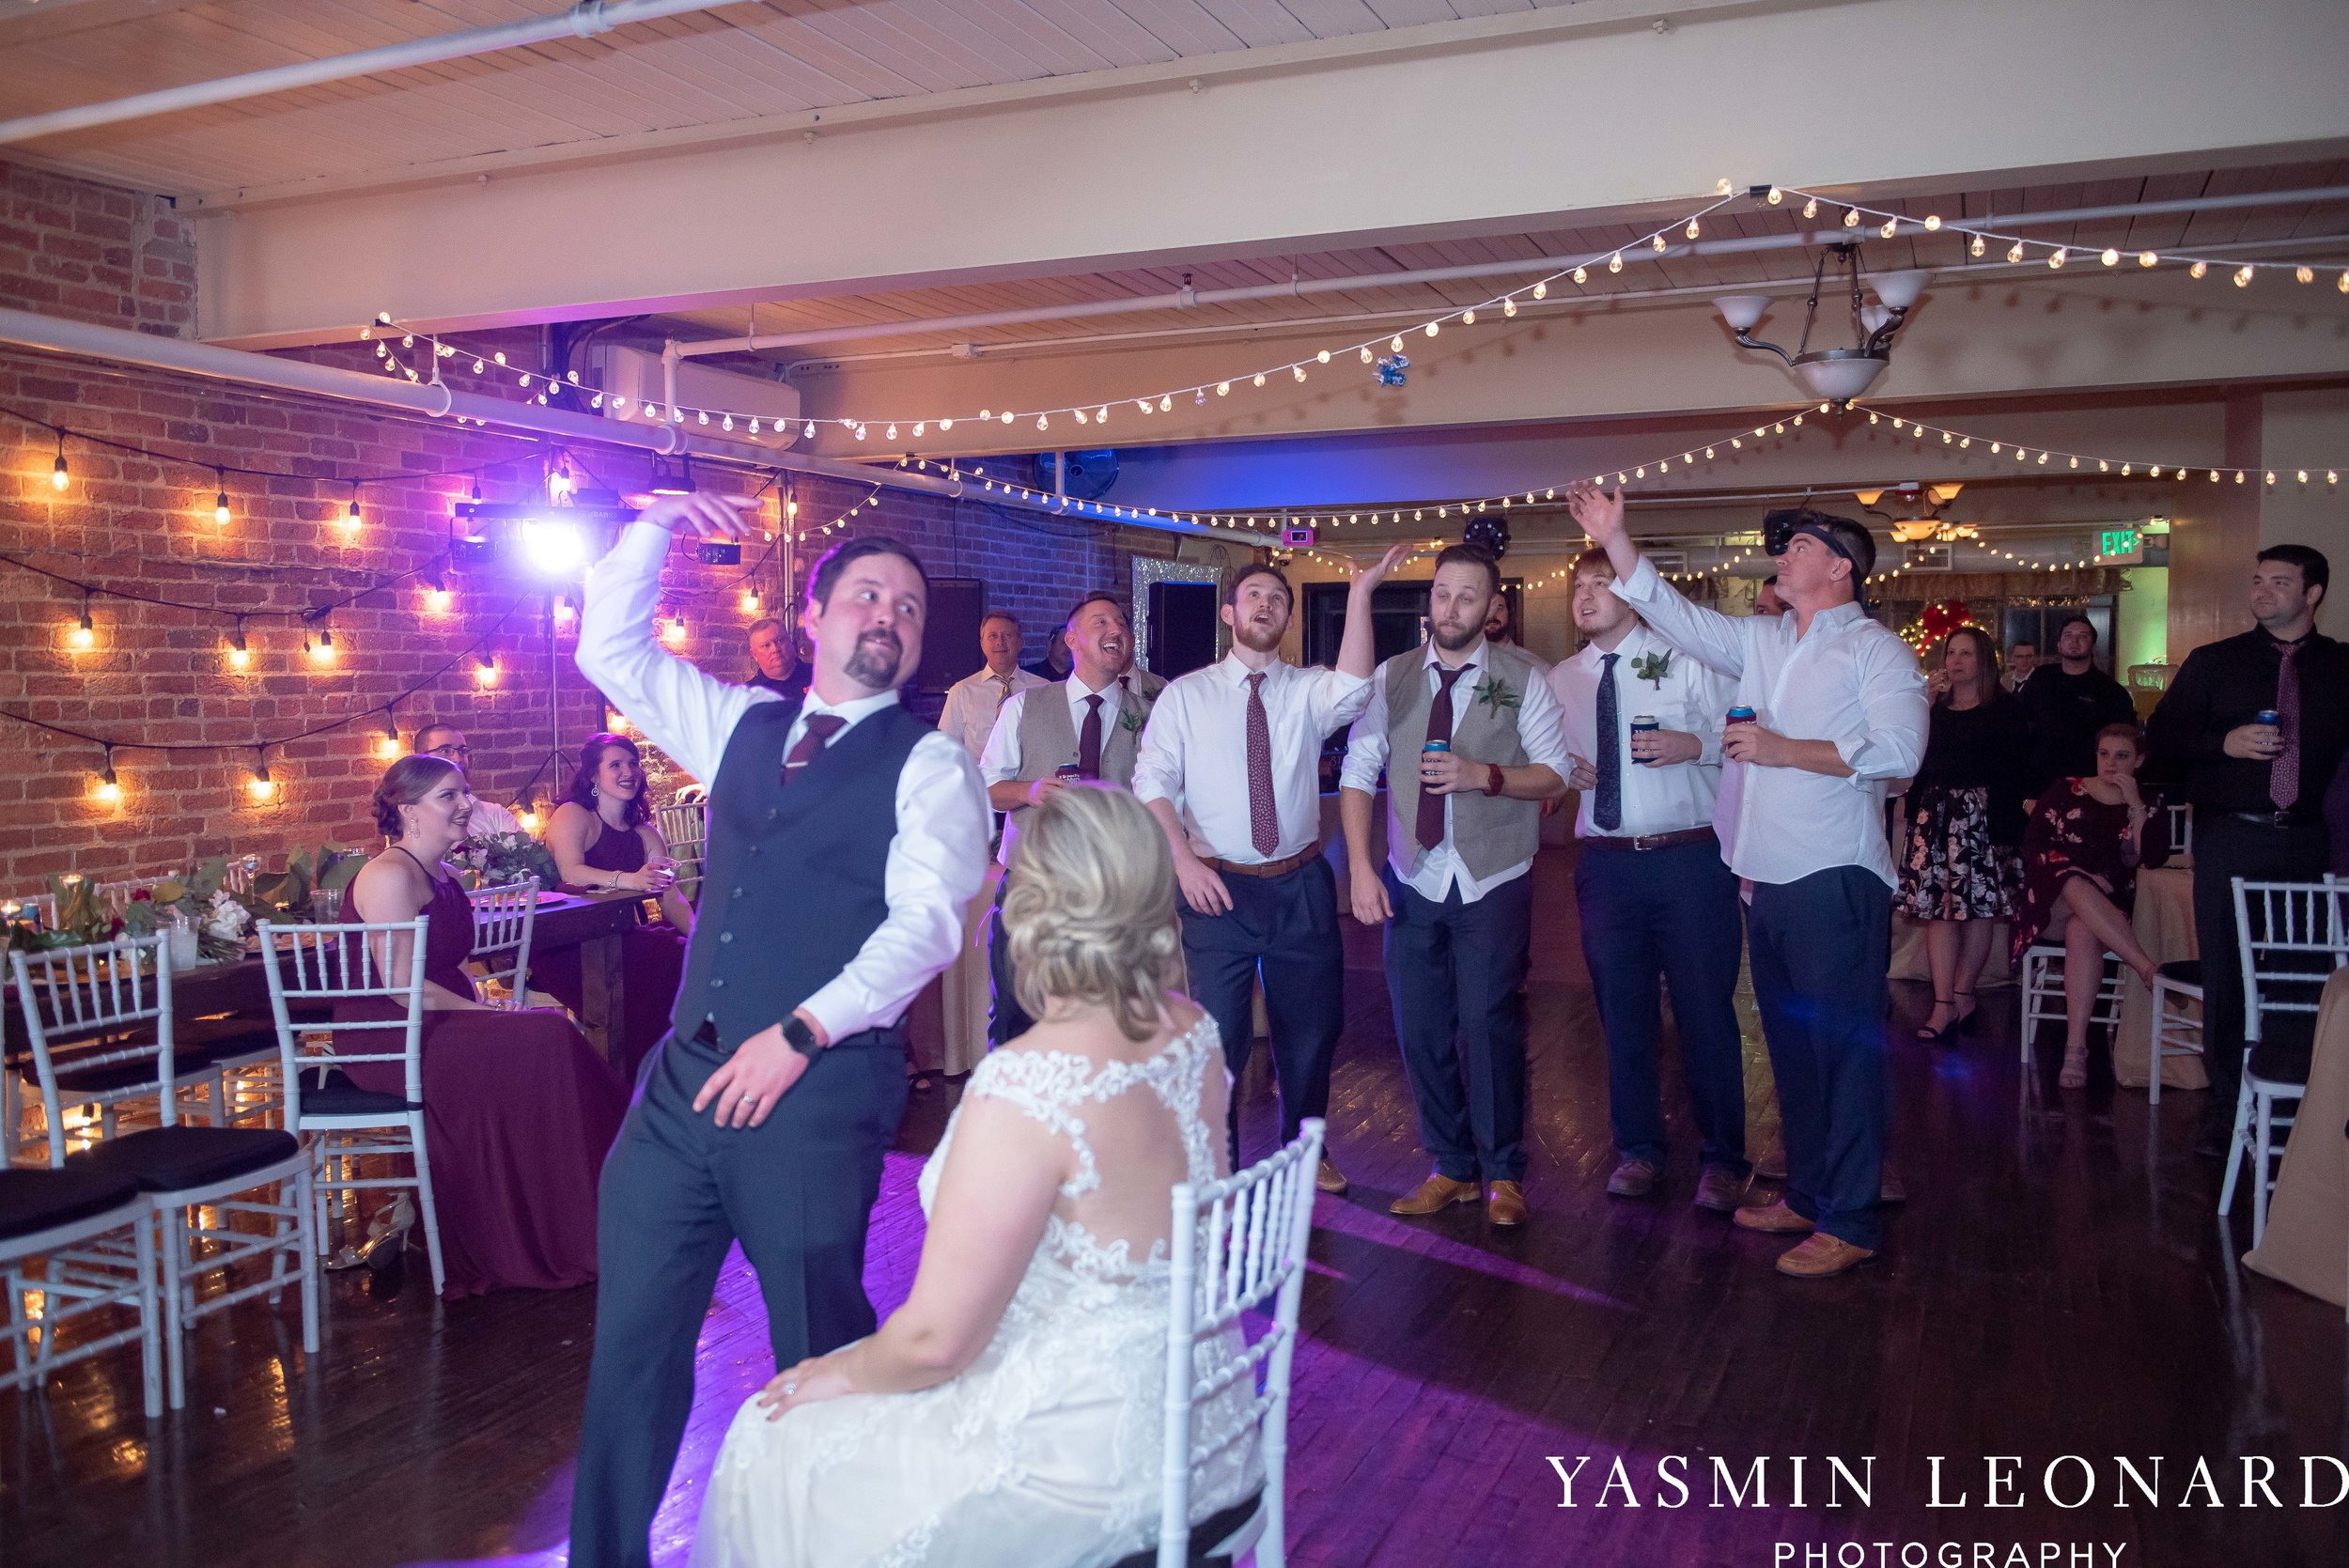 Rebekah and Matt - 105 Worth Event Centre - Yasmin Leonard Photography - Asheboro Wedding - NC Wedding - High Point Weddings - Triad Weddings - Winter Wedding-72.jpg